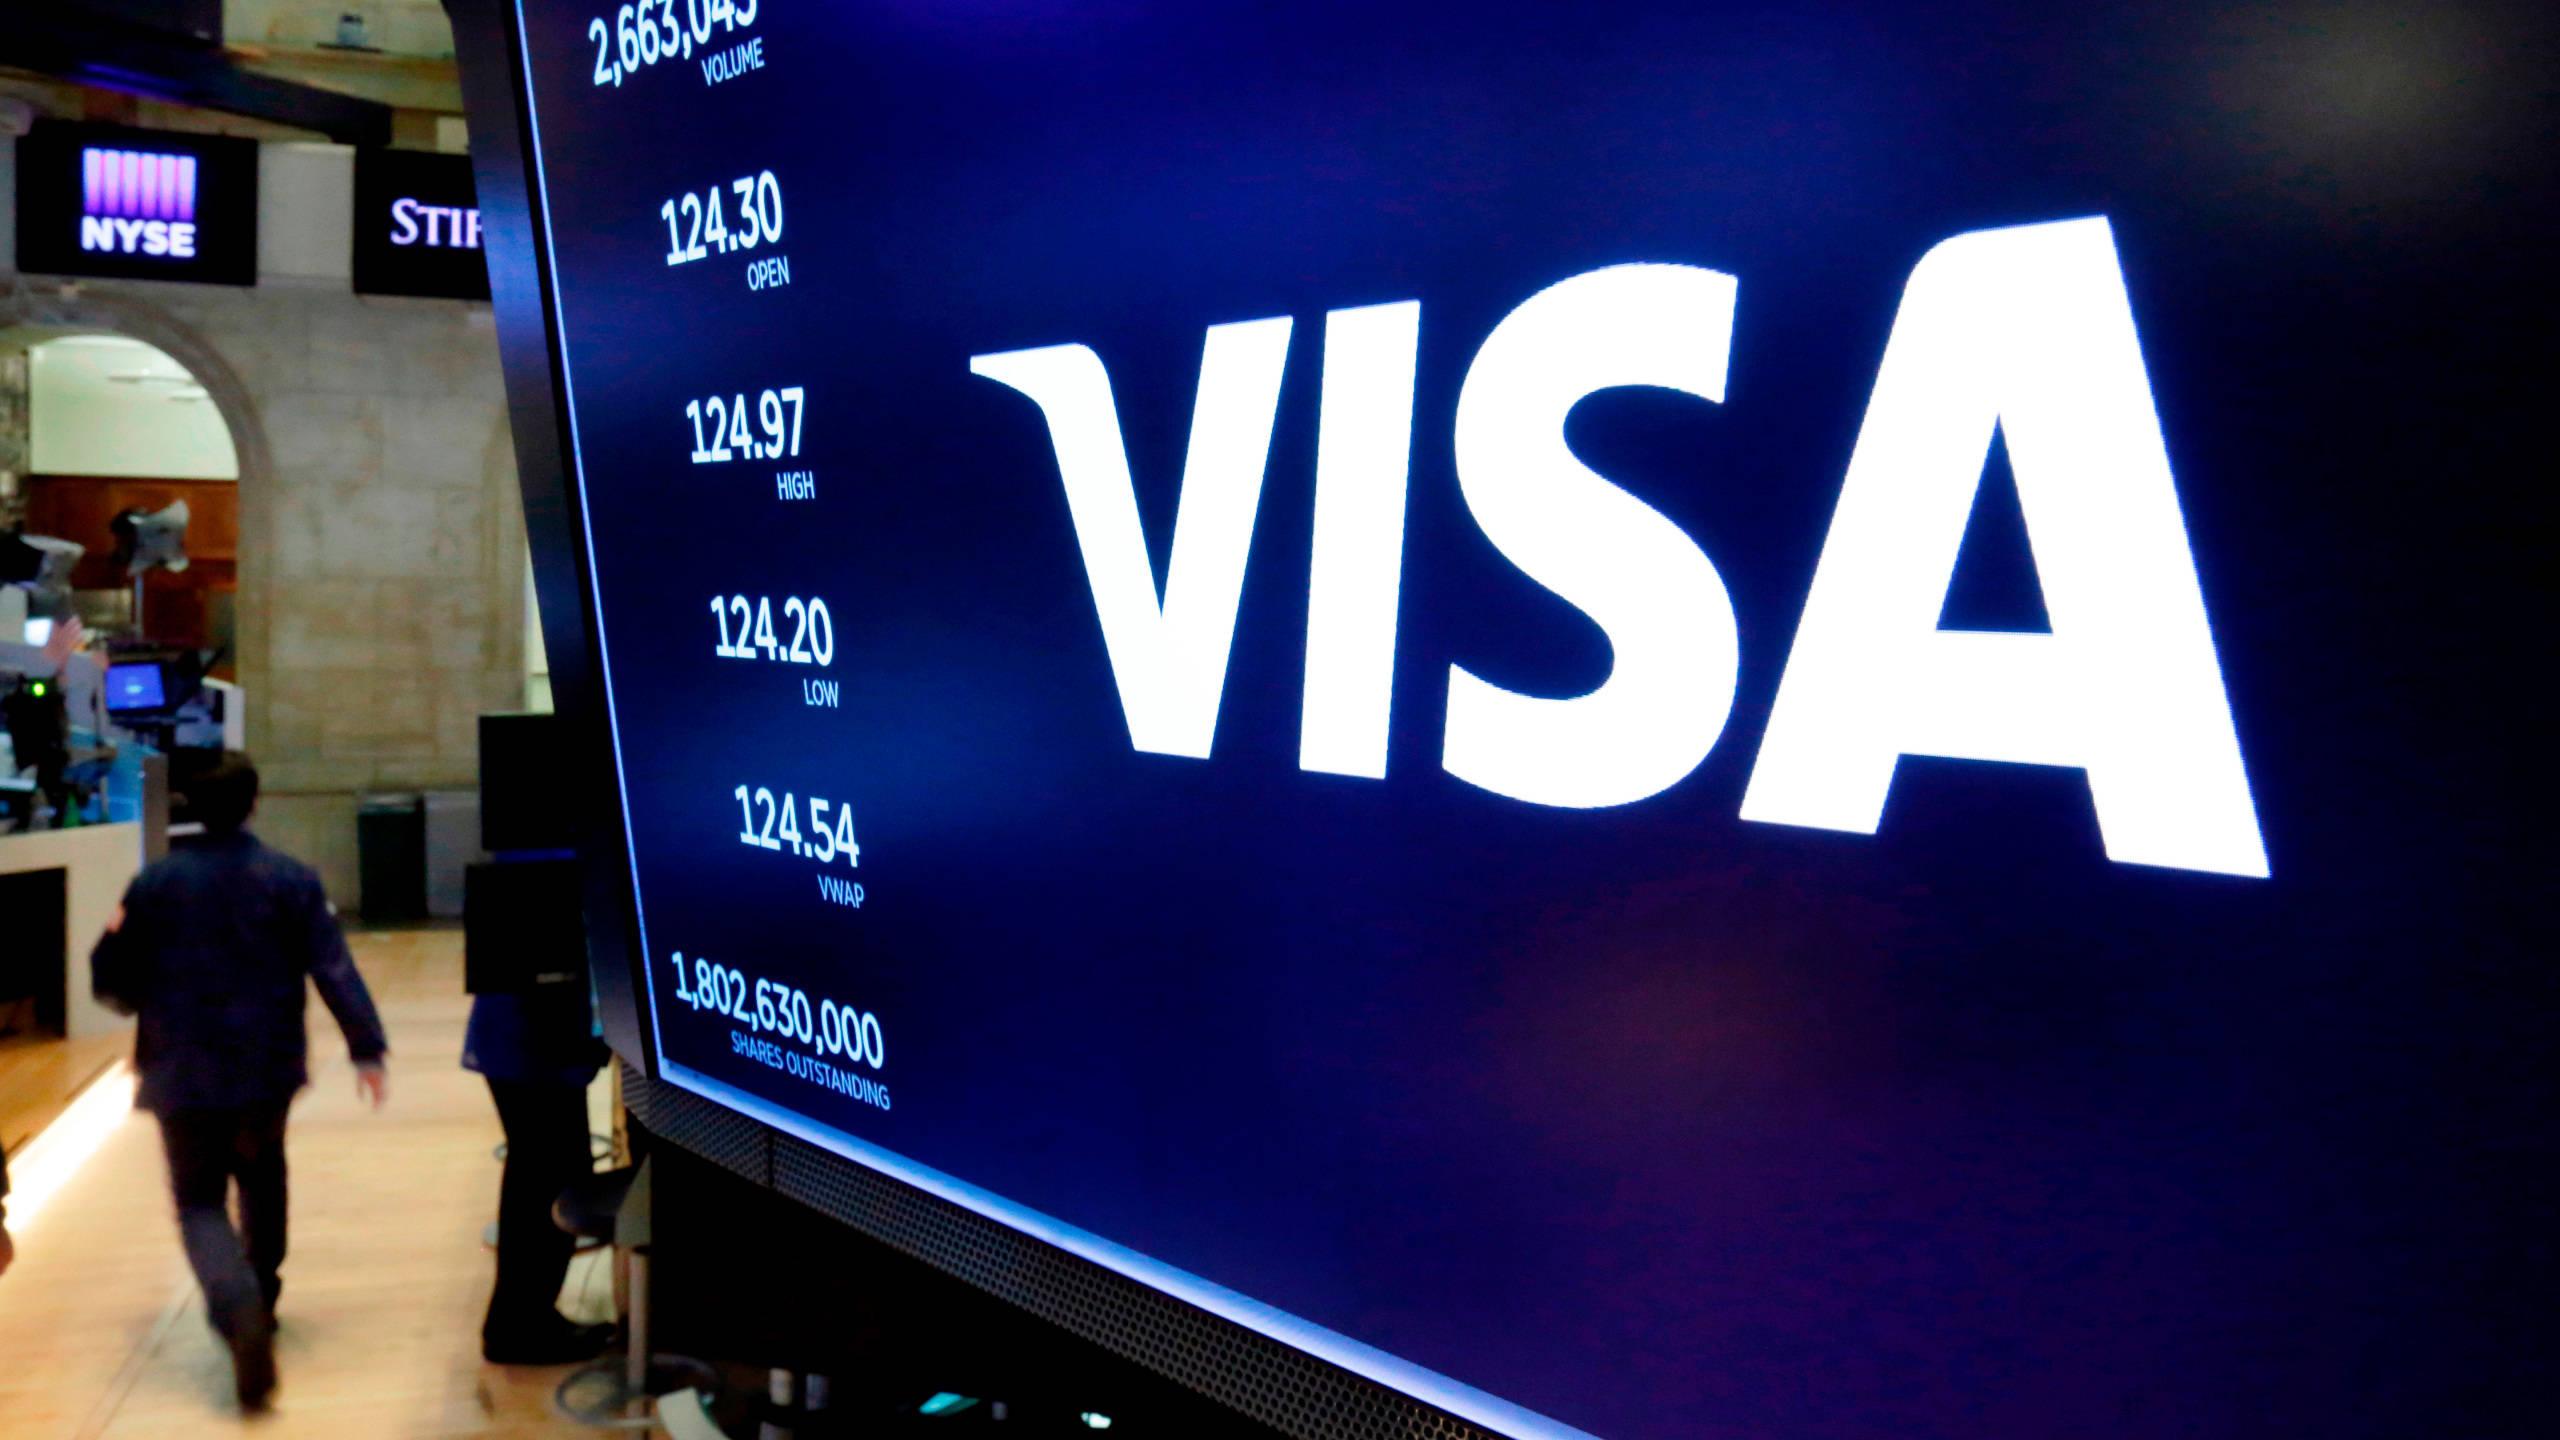 Visa终止对金融科技公司Plaid 53亿美元收购计划